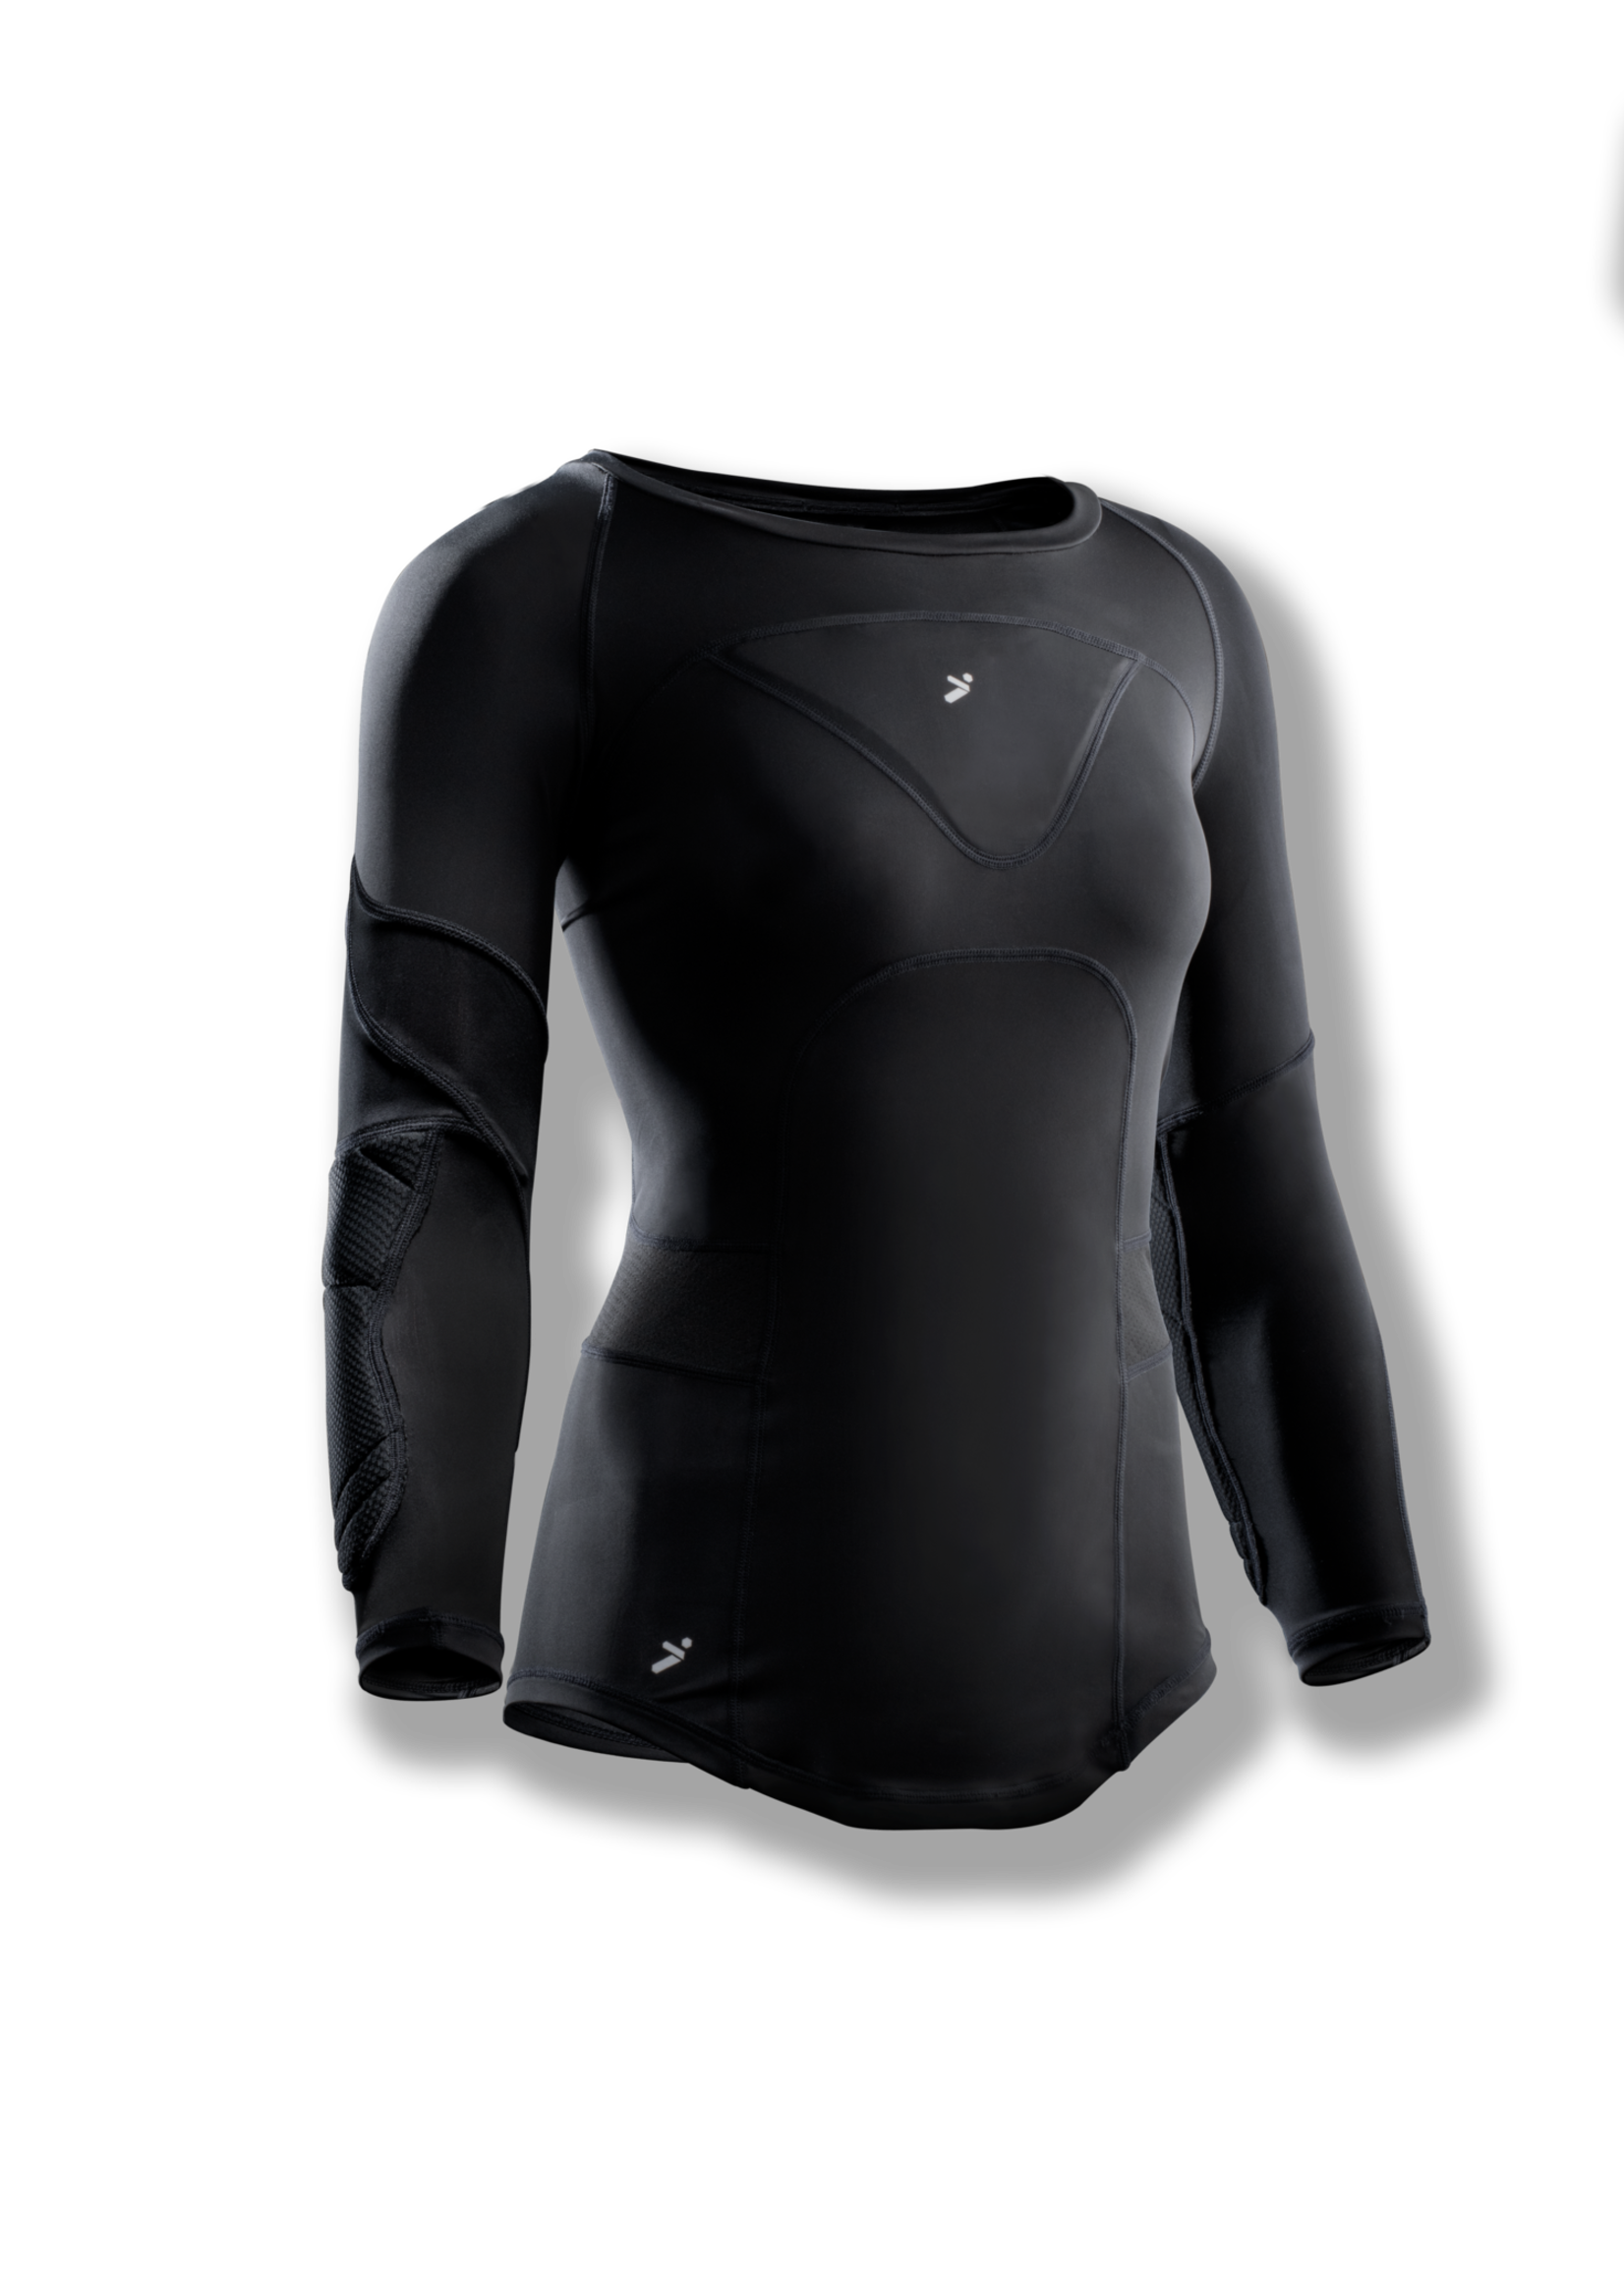 Storelli BodyShield Goalkeeper 3/4 Undershirt Womens